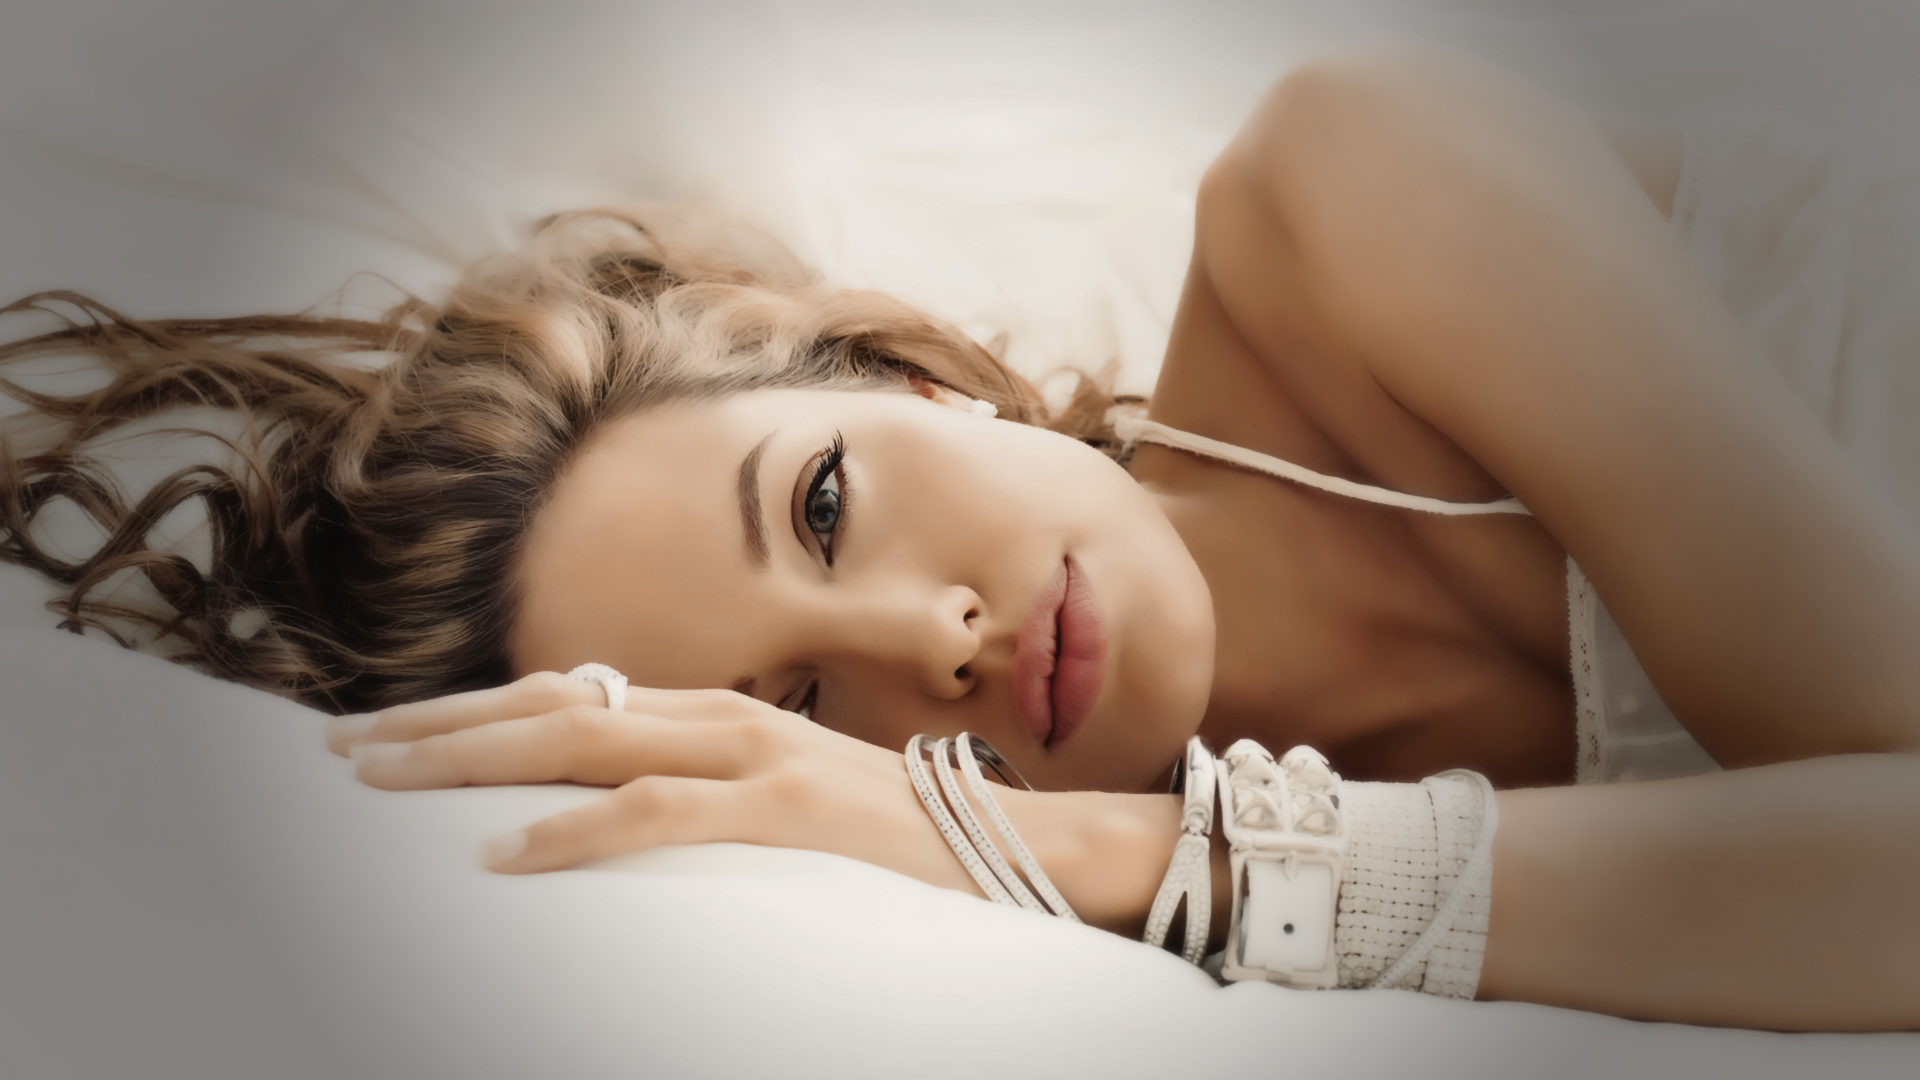 Angelina Jolie 9 Wallpapers HD Wallpapers 1920x1080